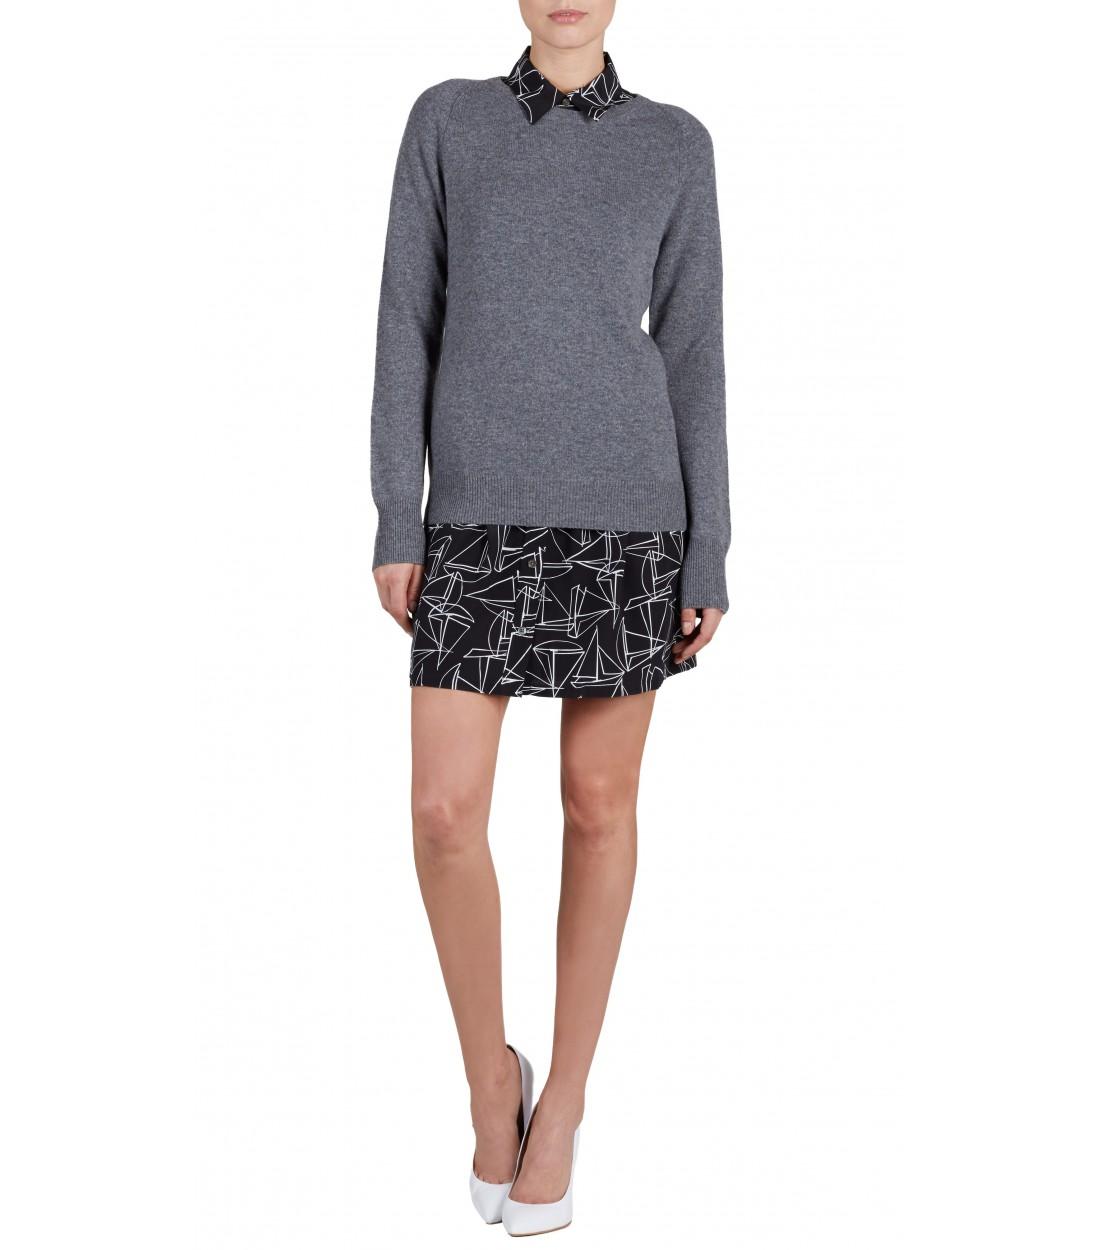 EQUIPMENT Sloane Crewneck Heather Grey   Women's Cashmere Sweater